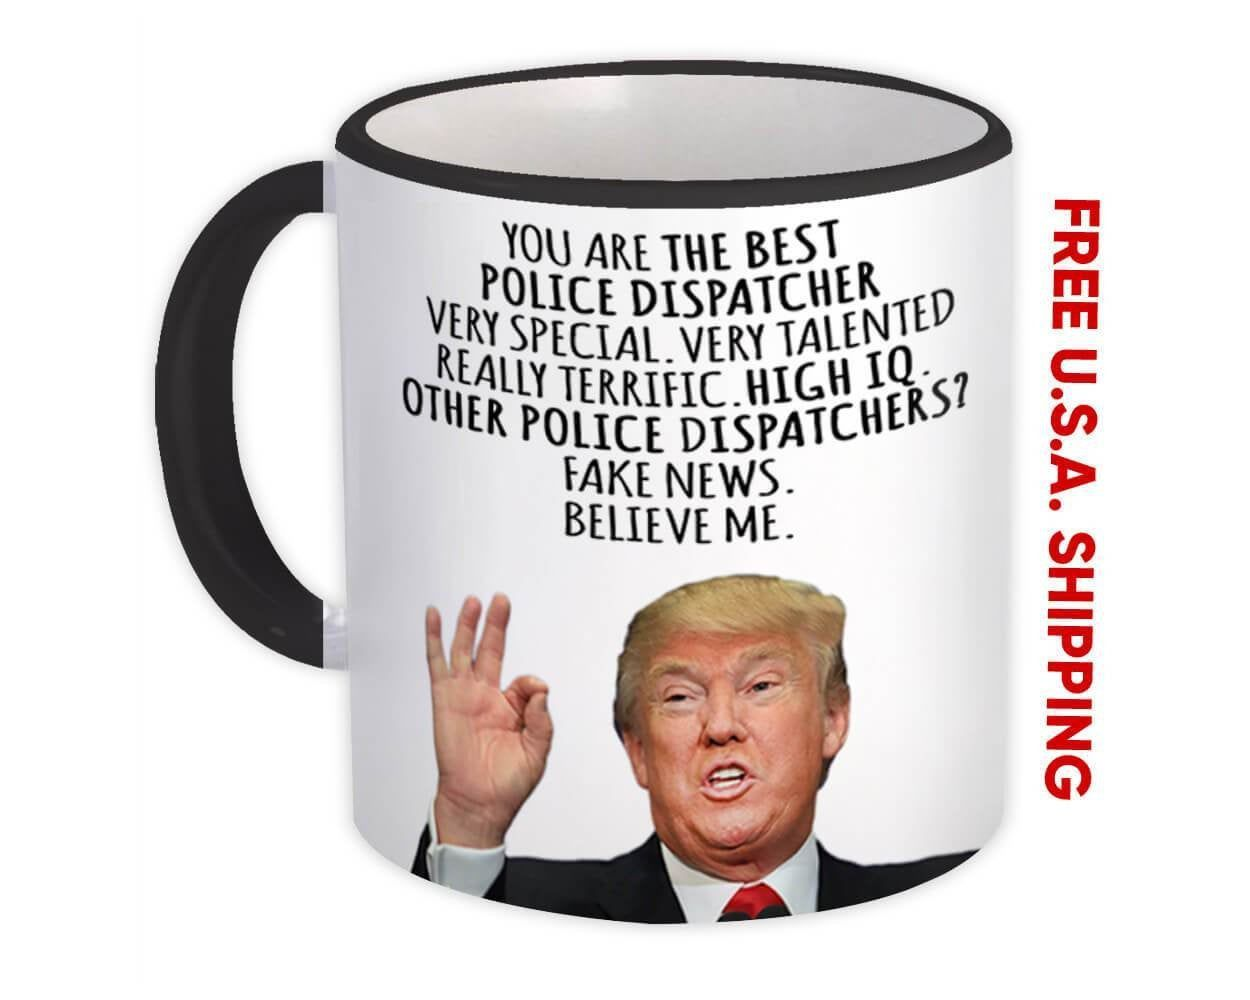 POLICE DISPATCHER Gift Funny Trump Mug Best Birthday